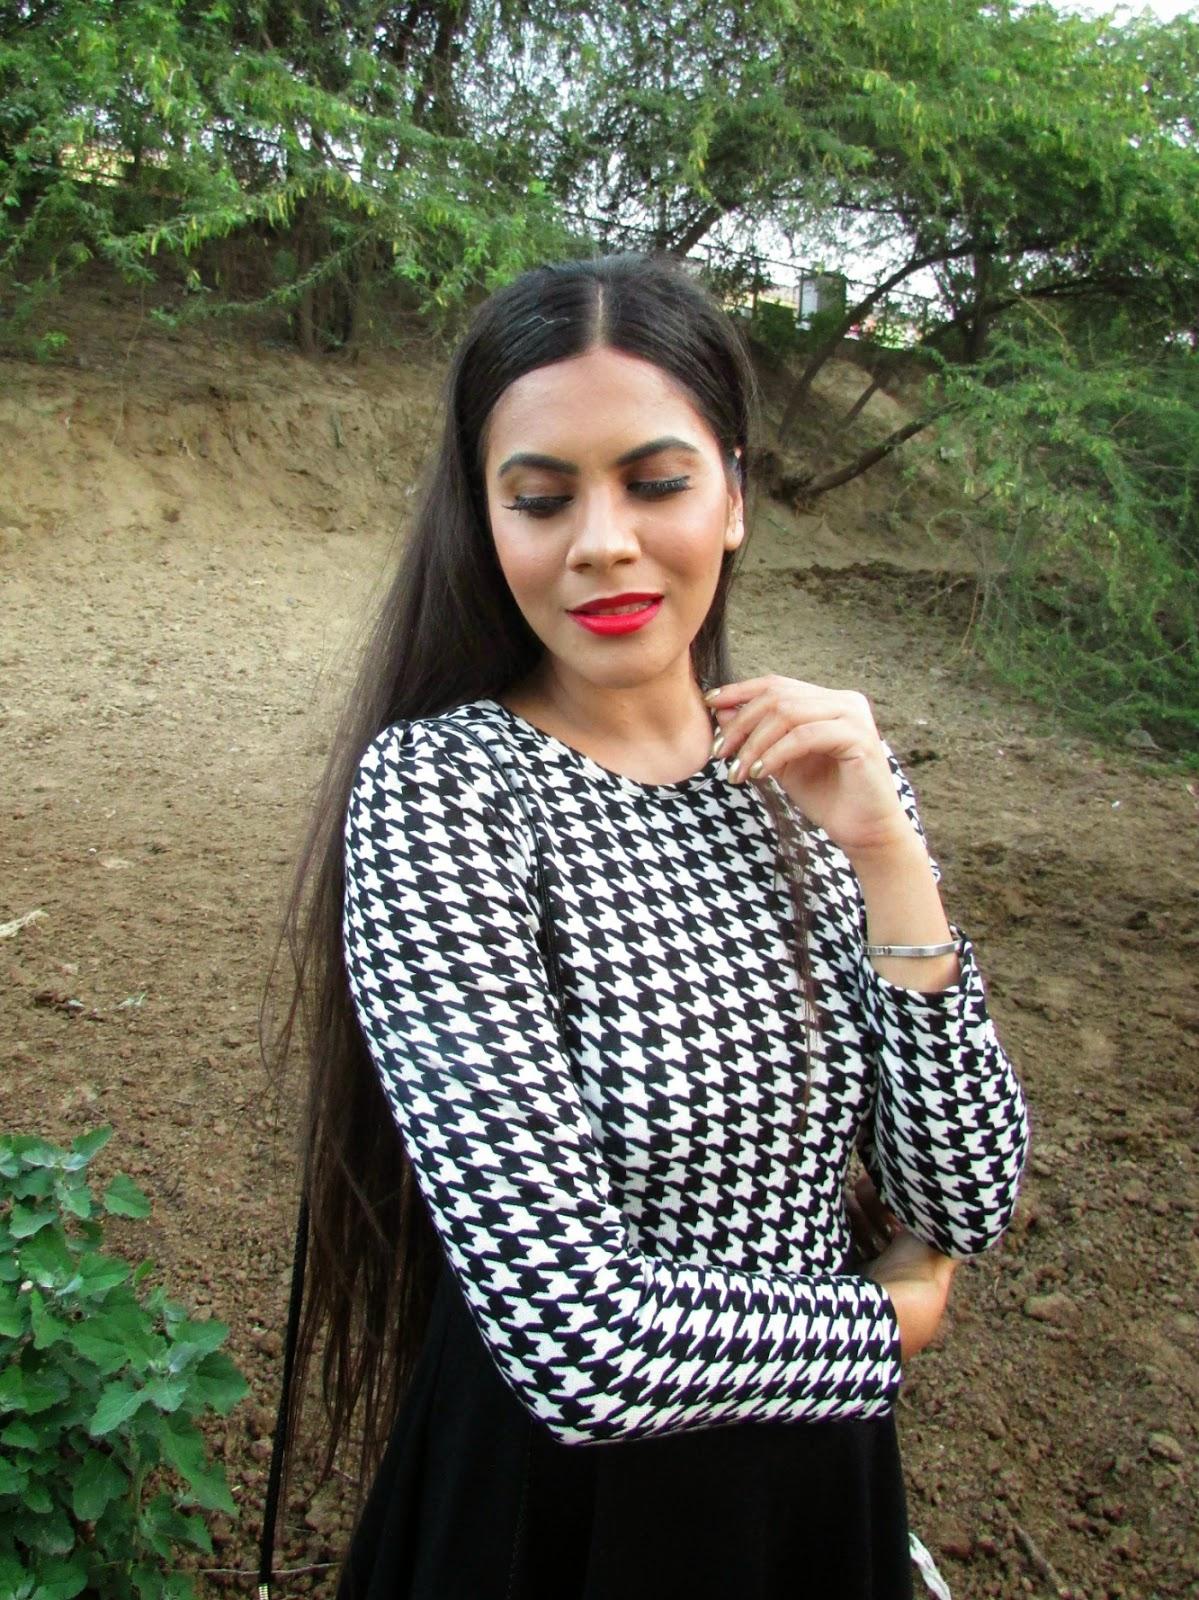 spring, summer dress, houndstooth dress, blackwhite dress, fashion, indianfashionblogger, LBD, summer dresses, cheap dresses o nline, wsdear, how to style houndstooth dress, retro outfit, vintage outfit, retro dress,beauty , fashion,beauty and fashion,beauty blog, fashion blog , indian beauty blog,indian fashion blog, beauty and fashion blog, indian beauty and fashion blog, indian bloggers, indian beauty bloggers, indian fashion bloggers,indian bloggers online, top 10 indian bloggers, top indian bloggers,top 10 fashion bloggers, indian bloggers on blogspot,home remedies, how to